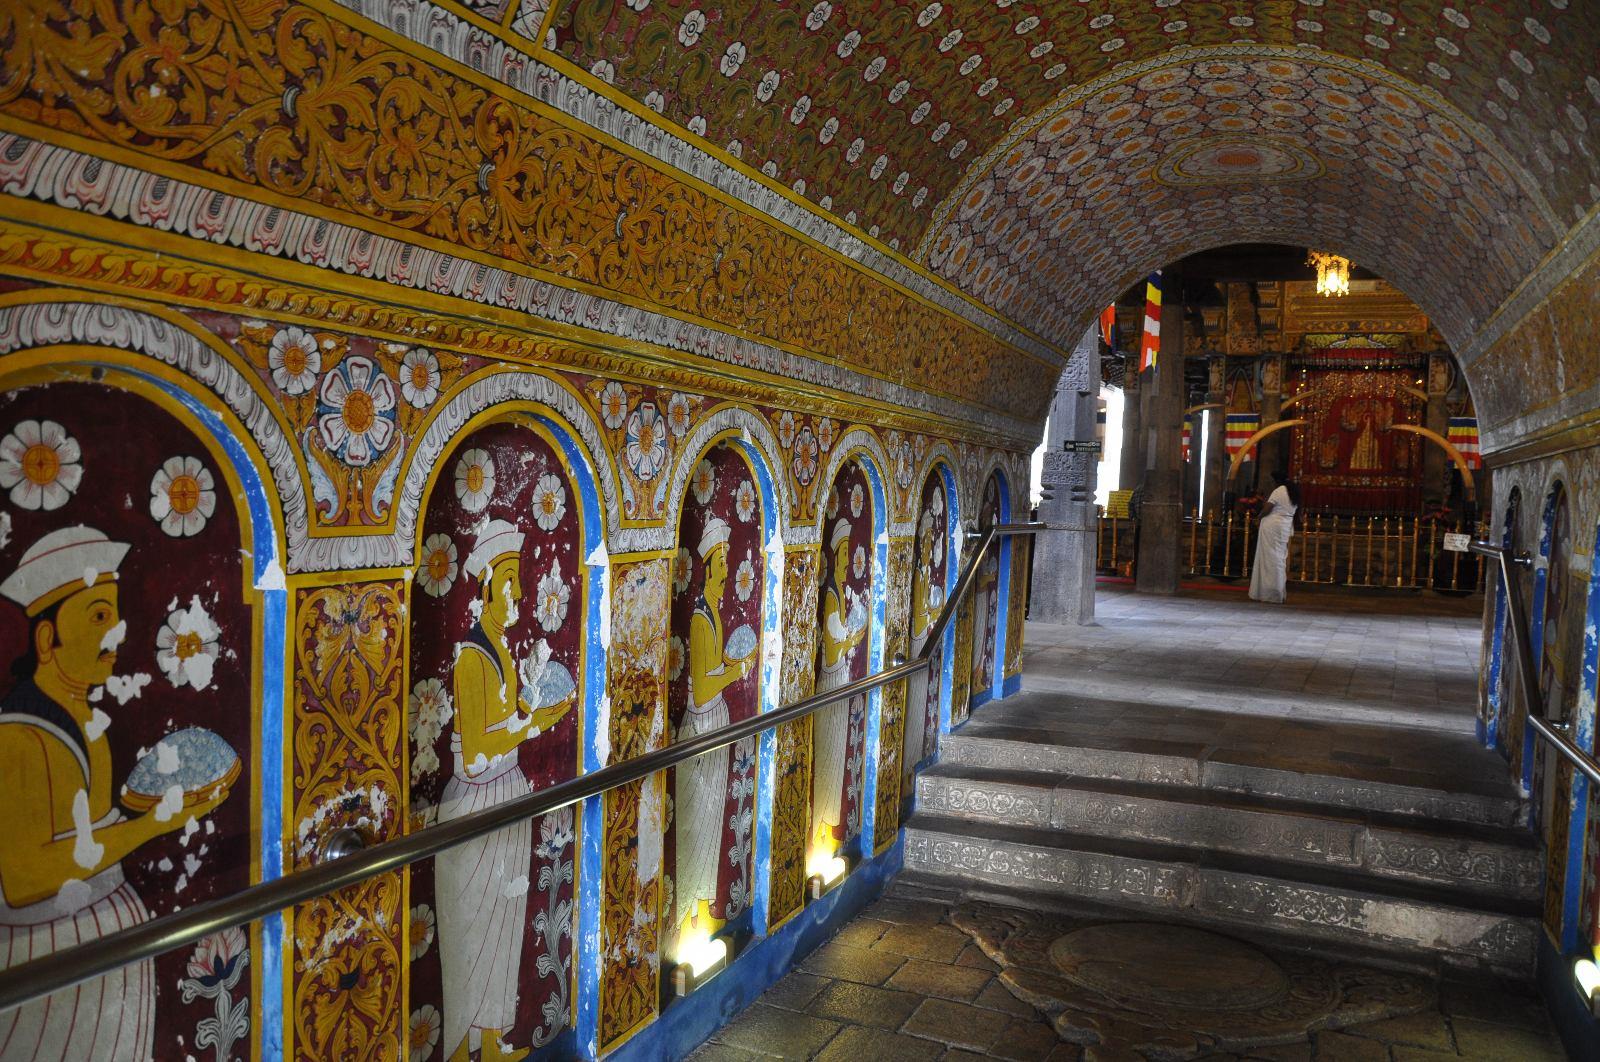 معبد دالادا مالیگاوا سریلانکا